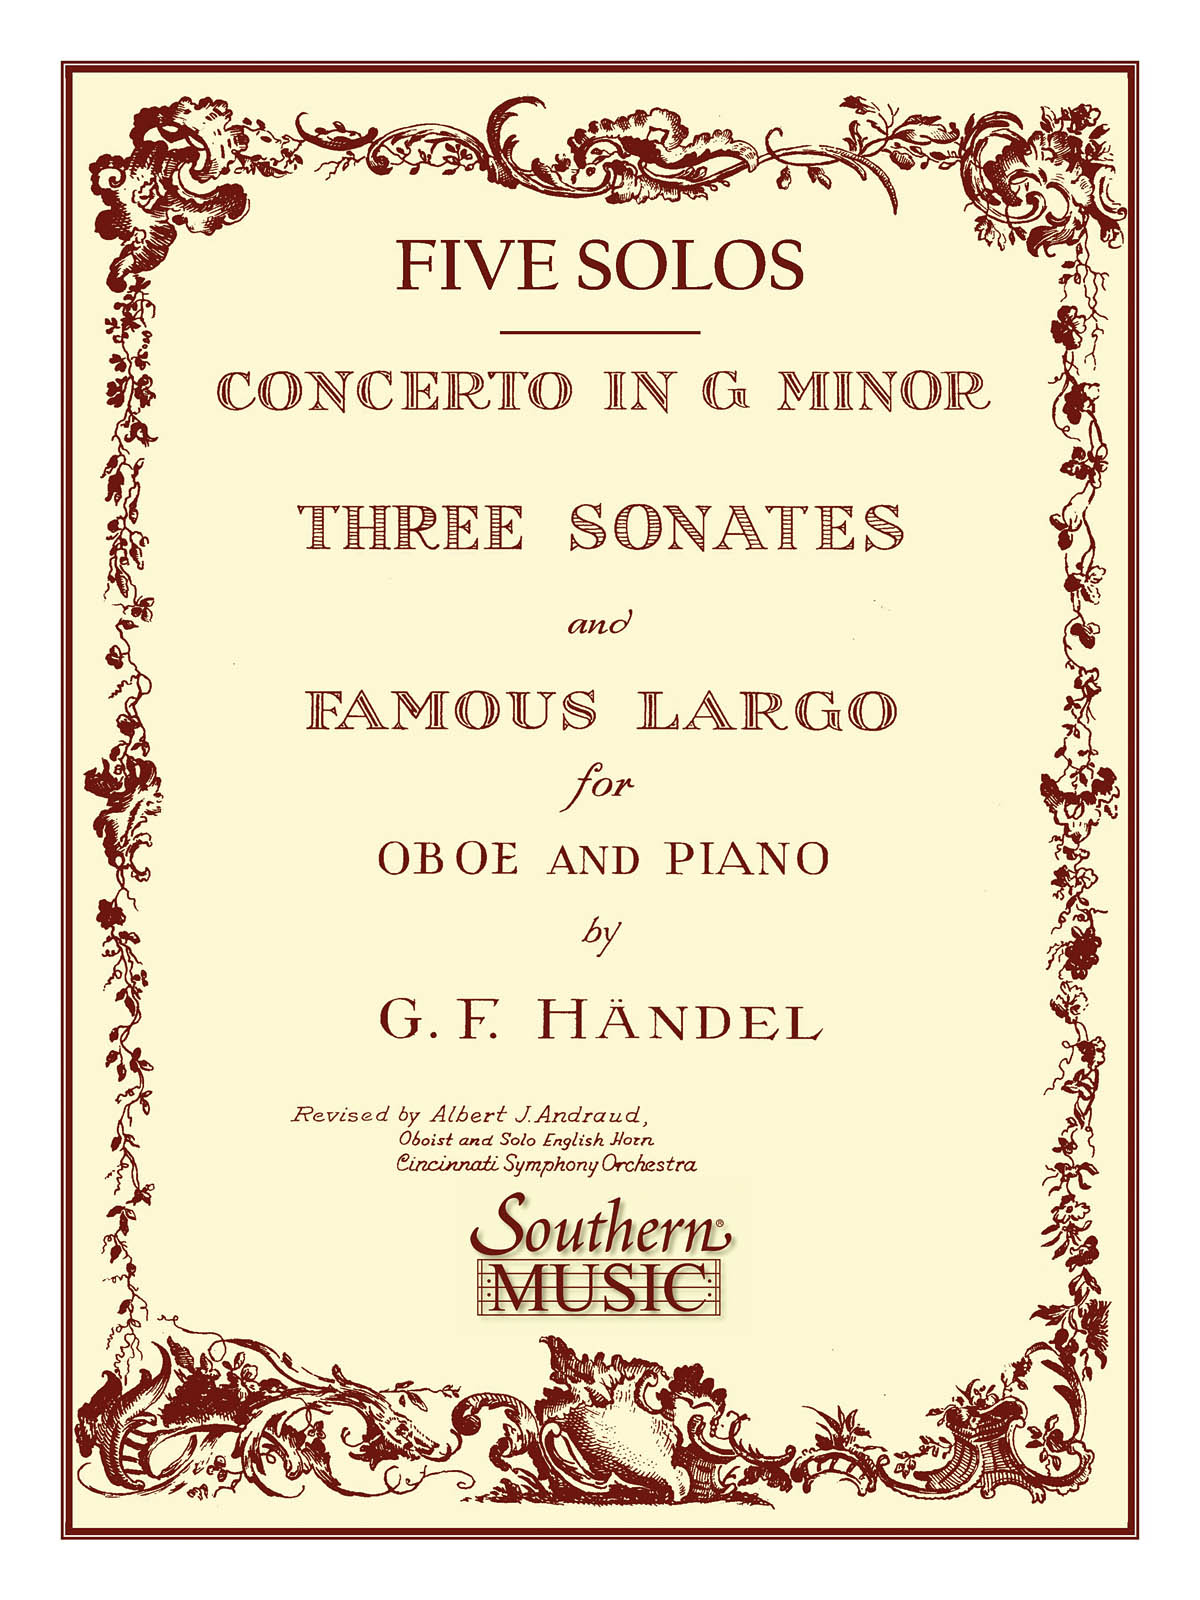 Georg Friedrich Händel: Three Sonates Famous Largo (Concerto G Minor): Oboe